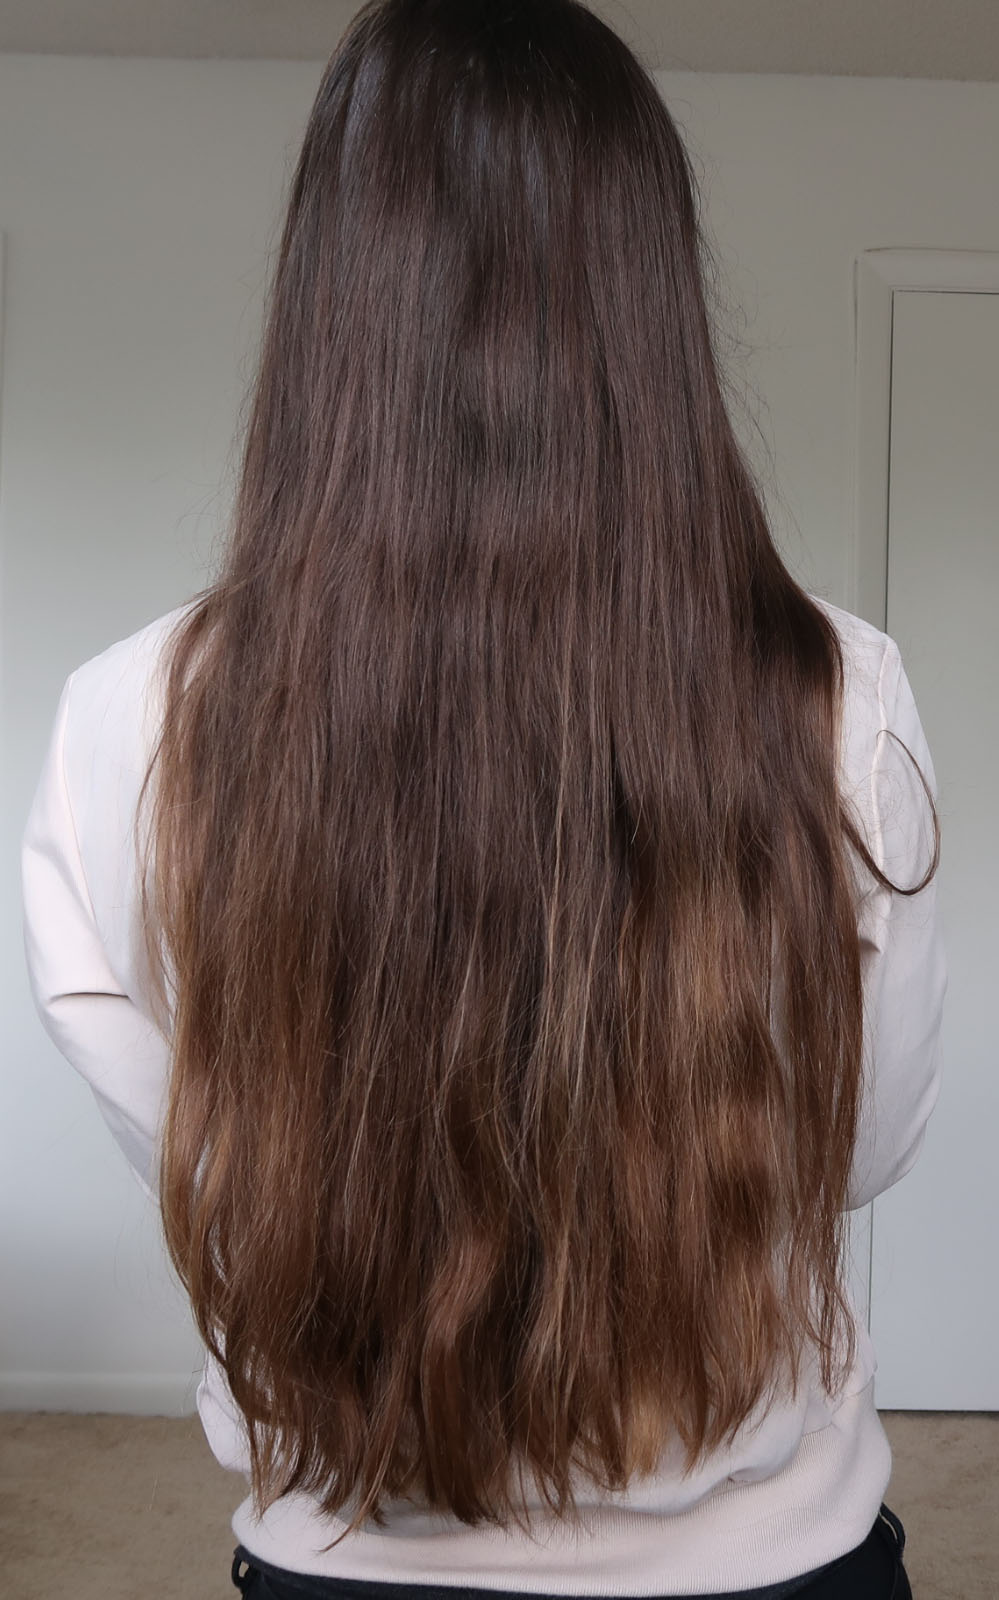 hair botox before